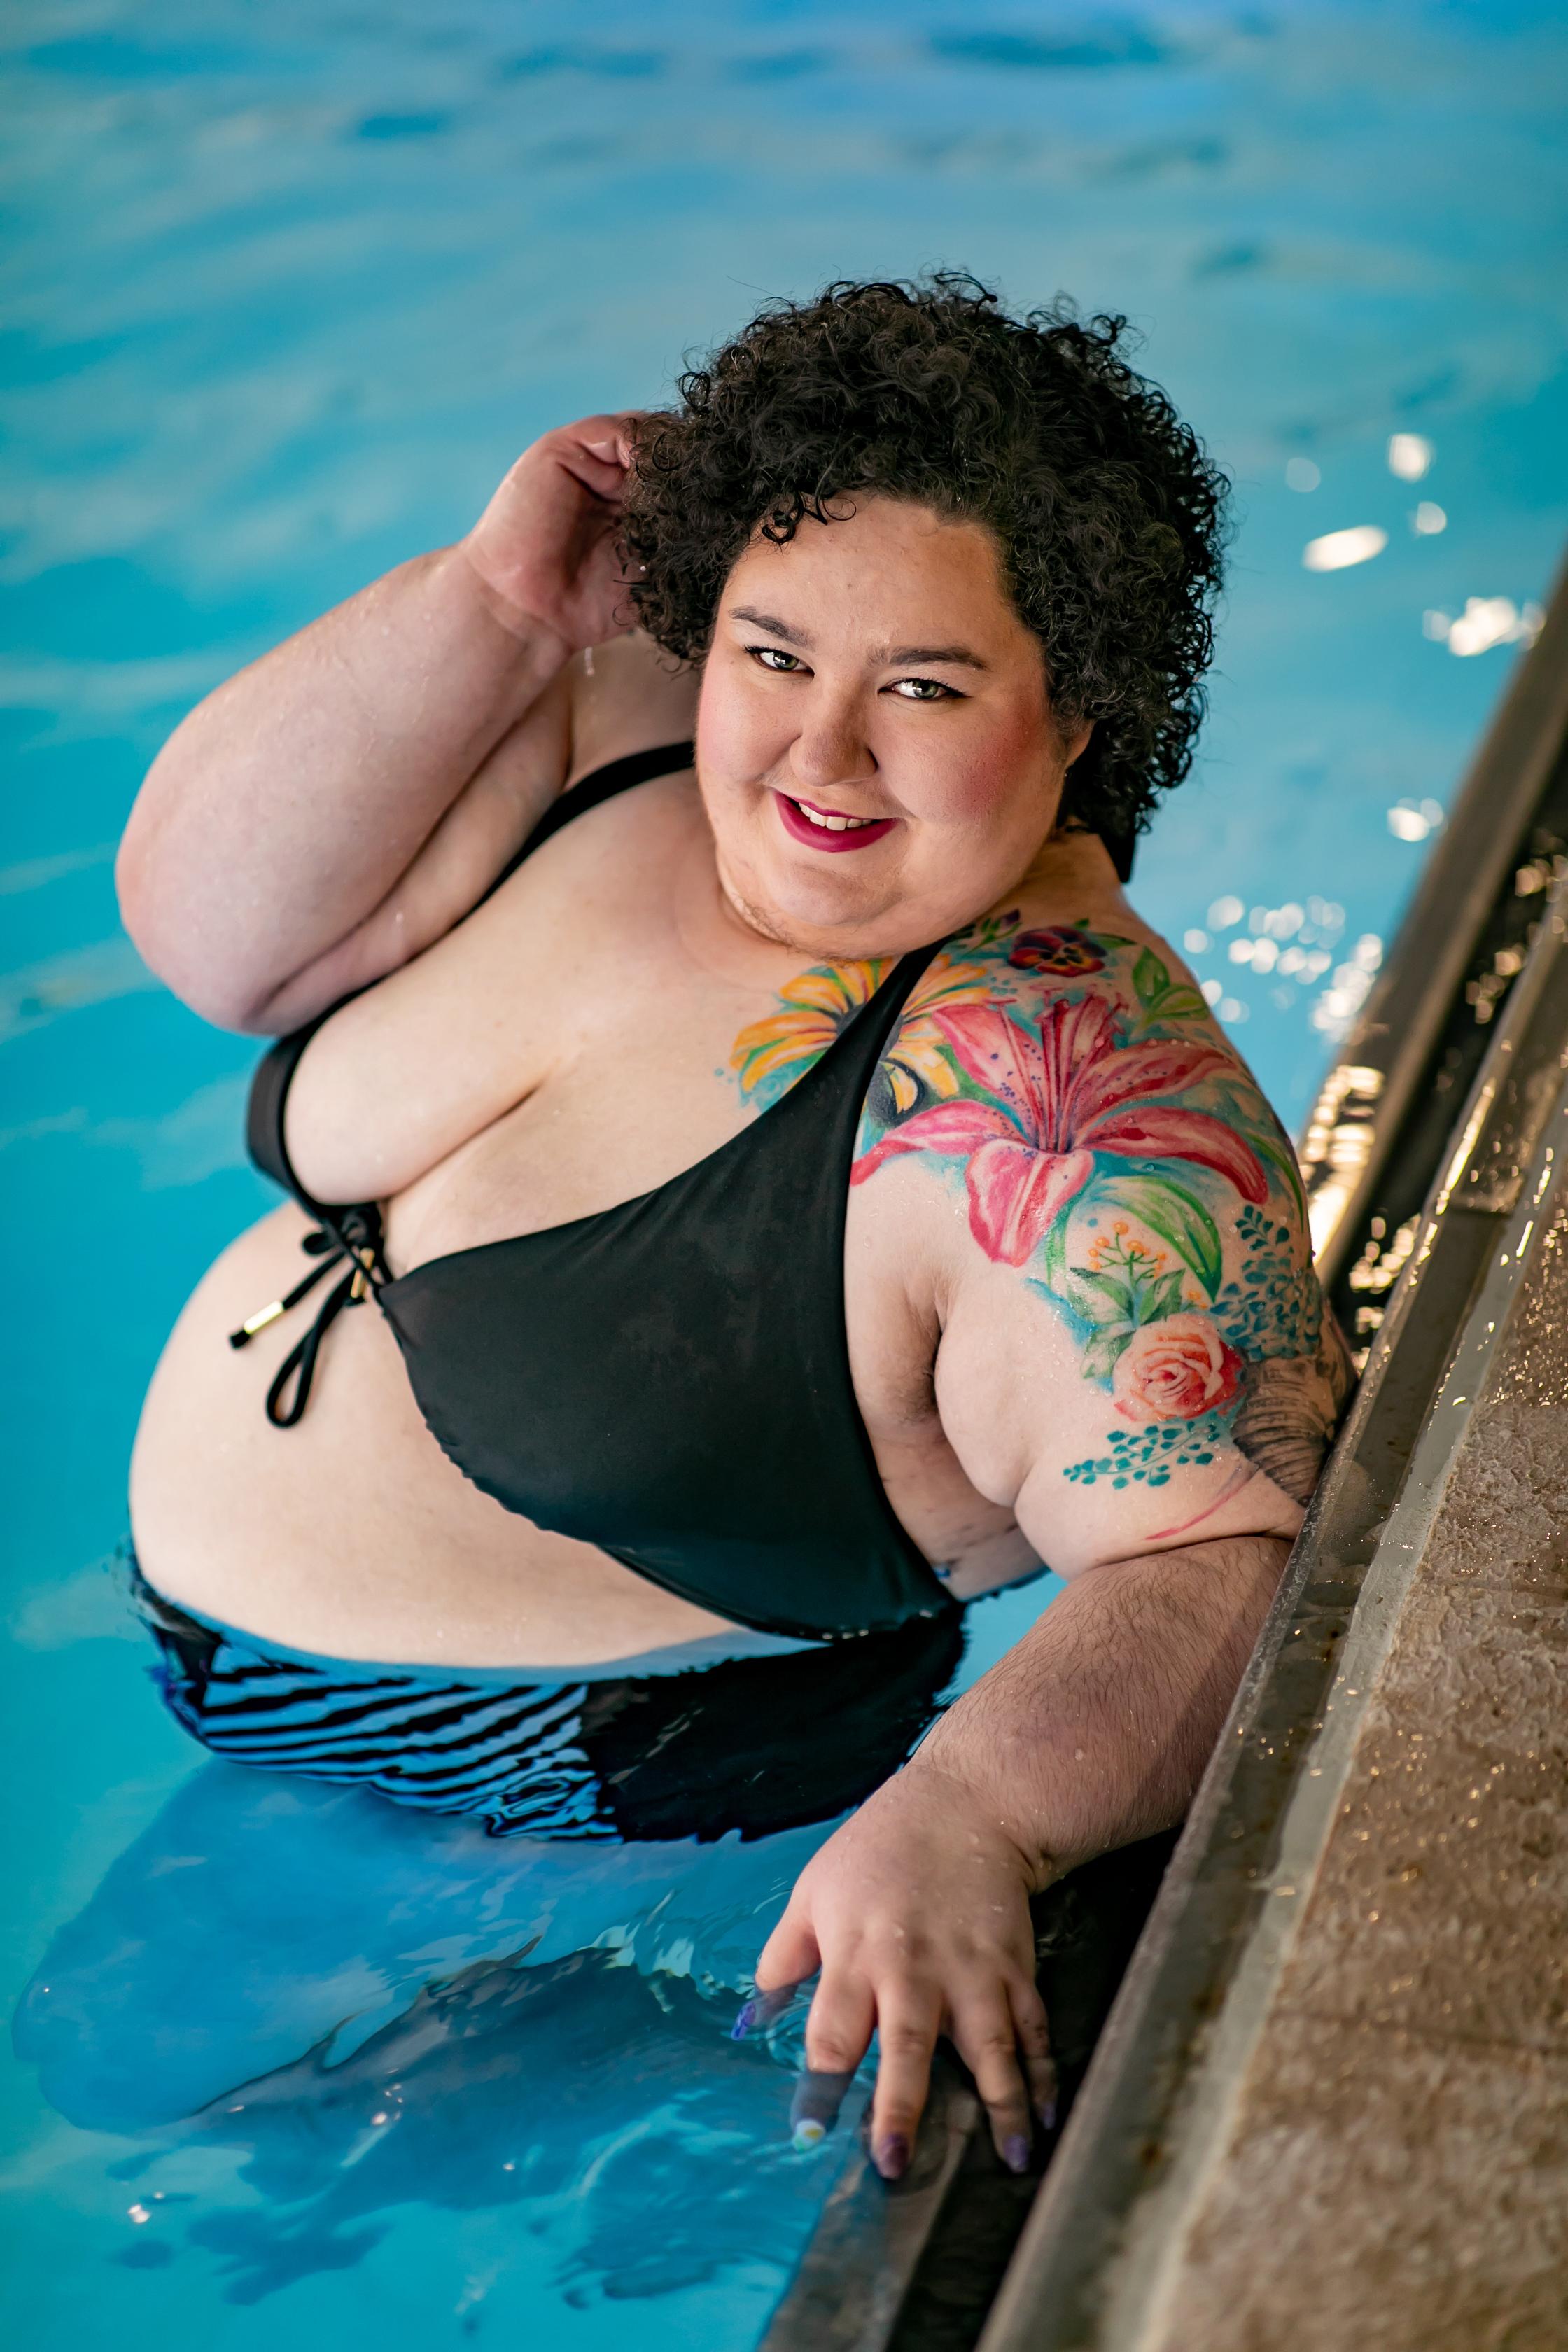 chicago lake county blogger influencer mechanic shop femme hilton hotel swimsuit-5957.jpg